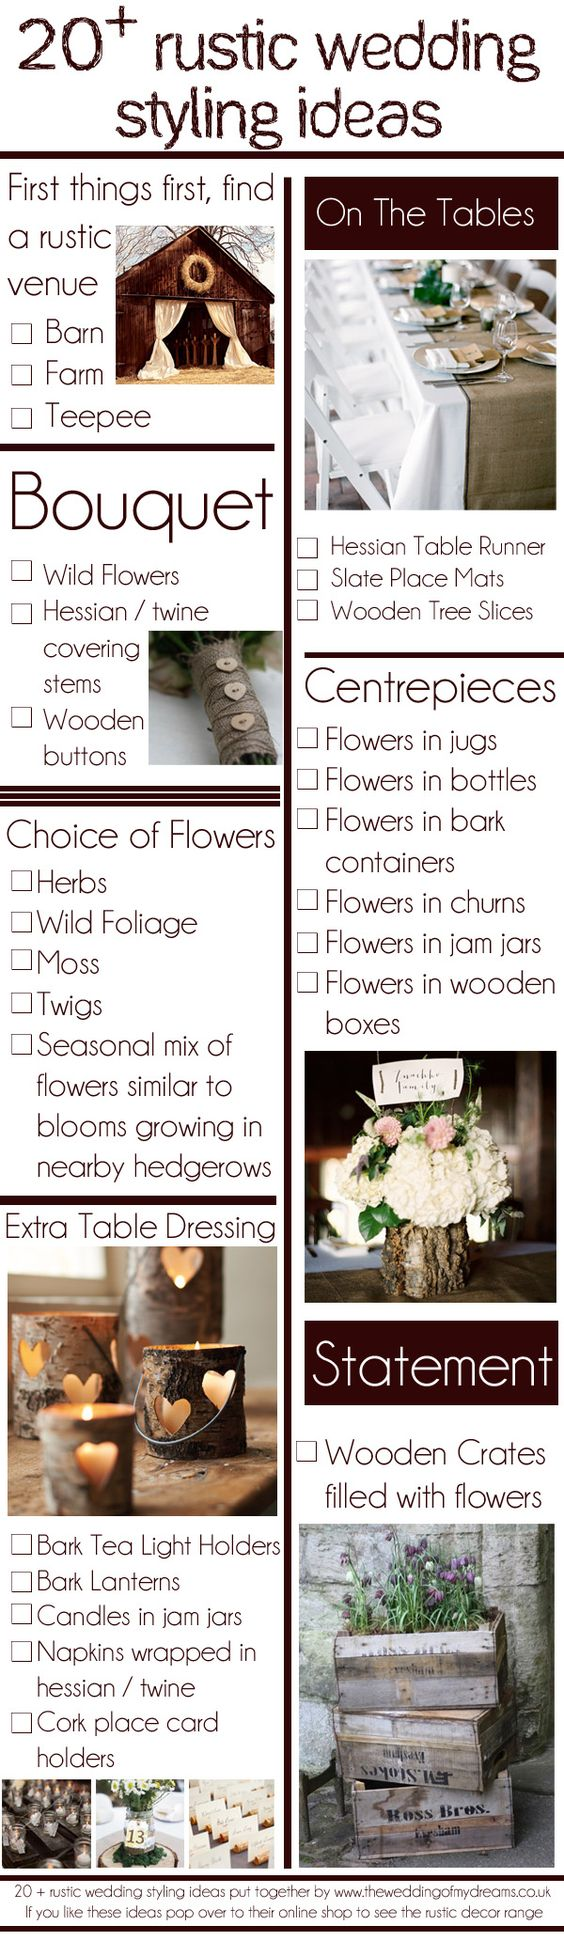 20 Rustic Wedding Styling Ideas | The Wedding of My DreamsThe Wedding of My Dreams